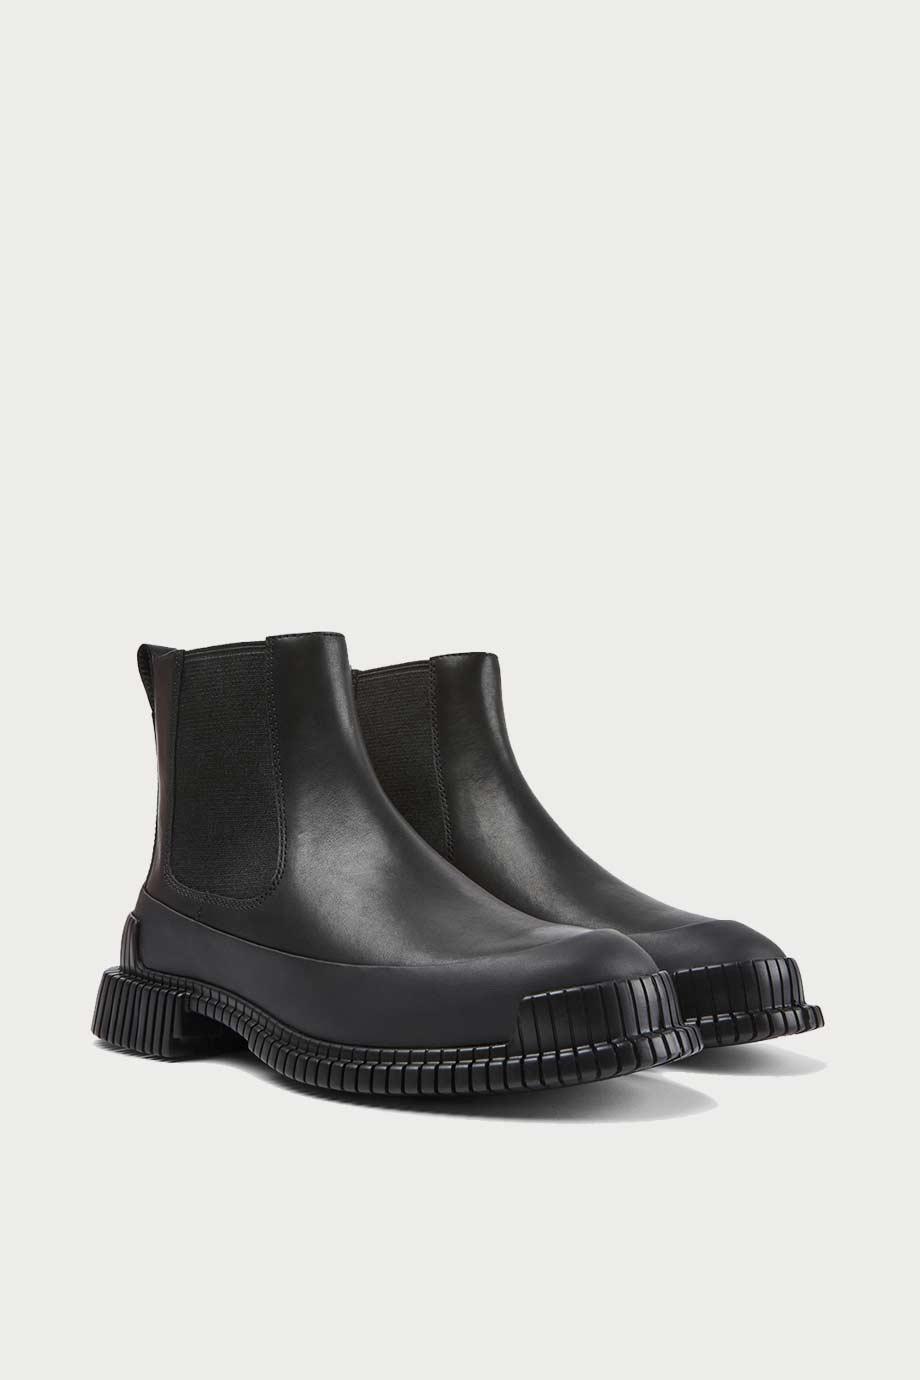 spiridoula metheniti shoes xalkida p K400304 014 camper 2